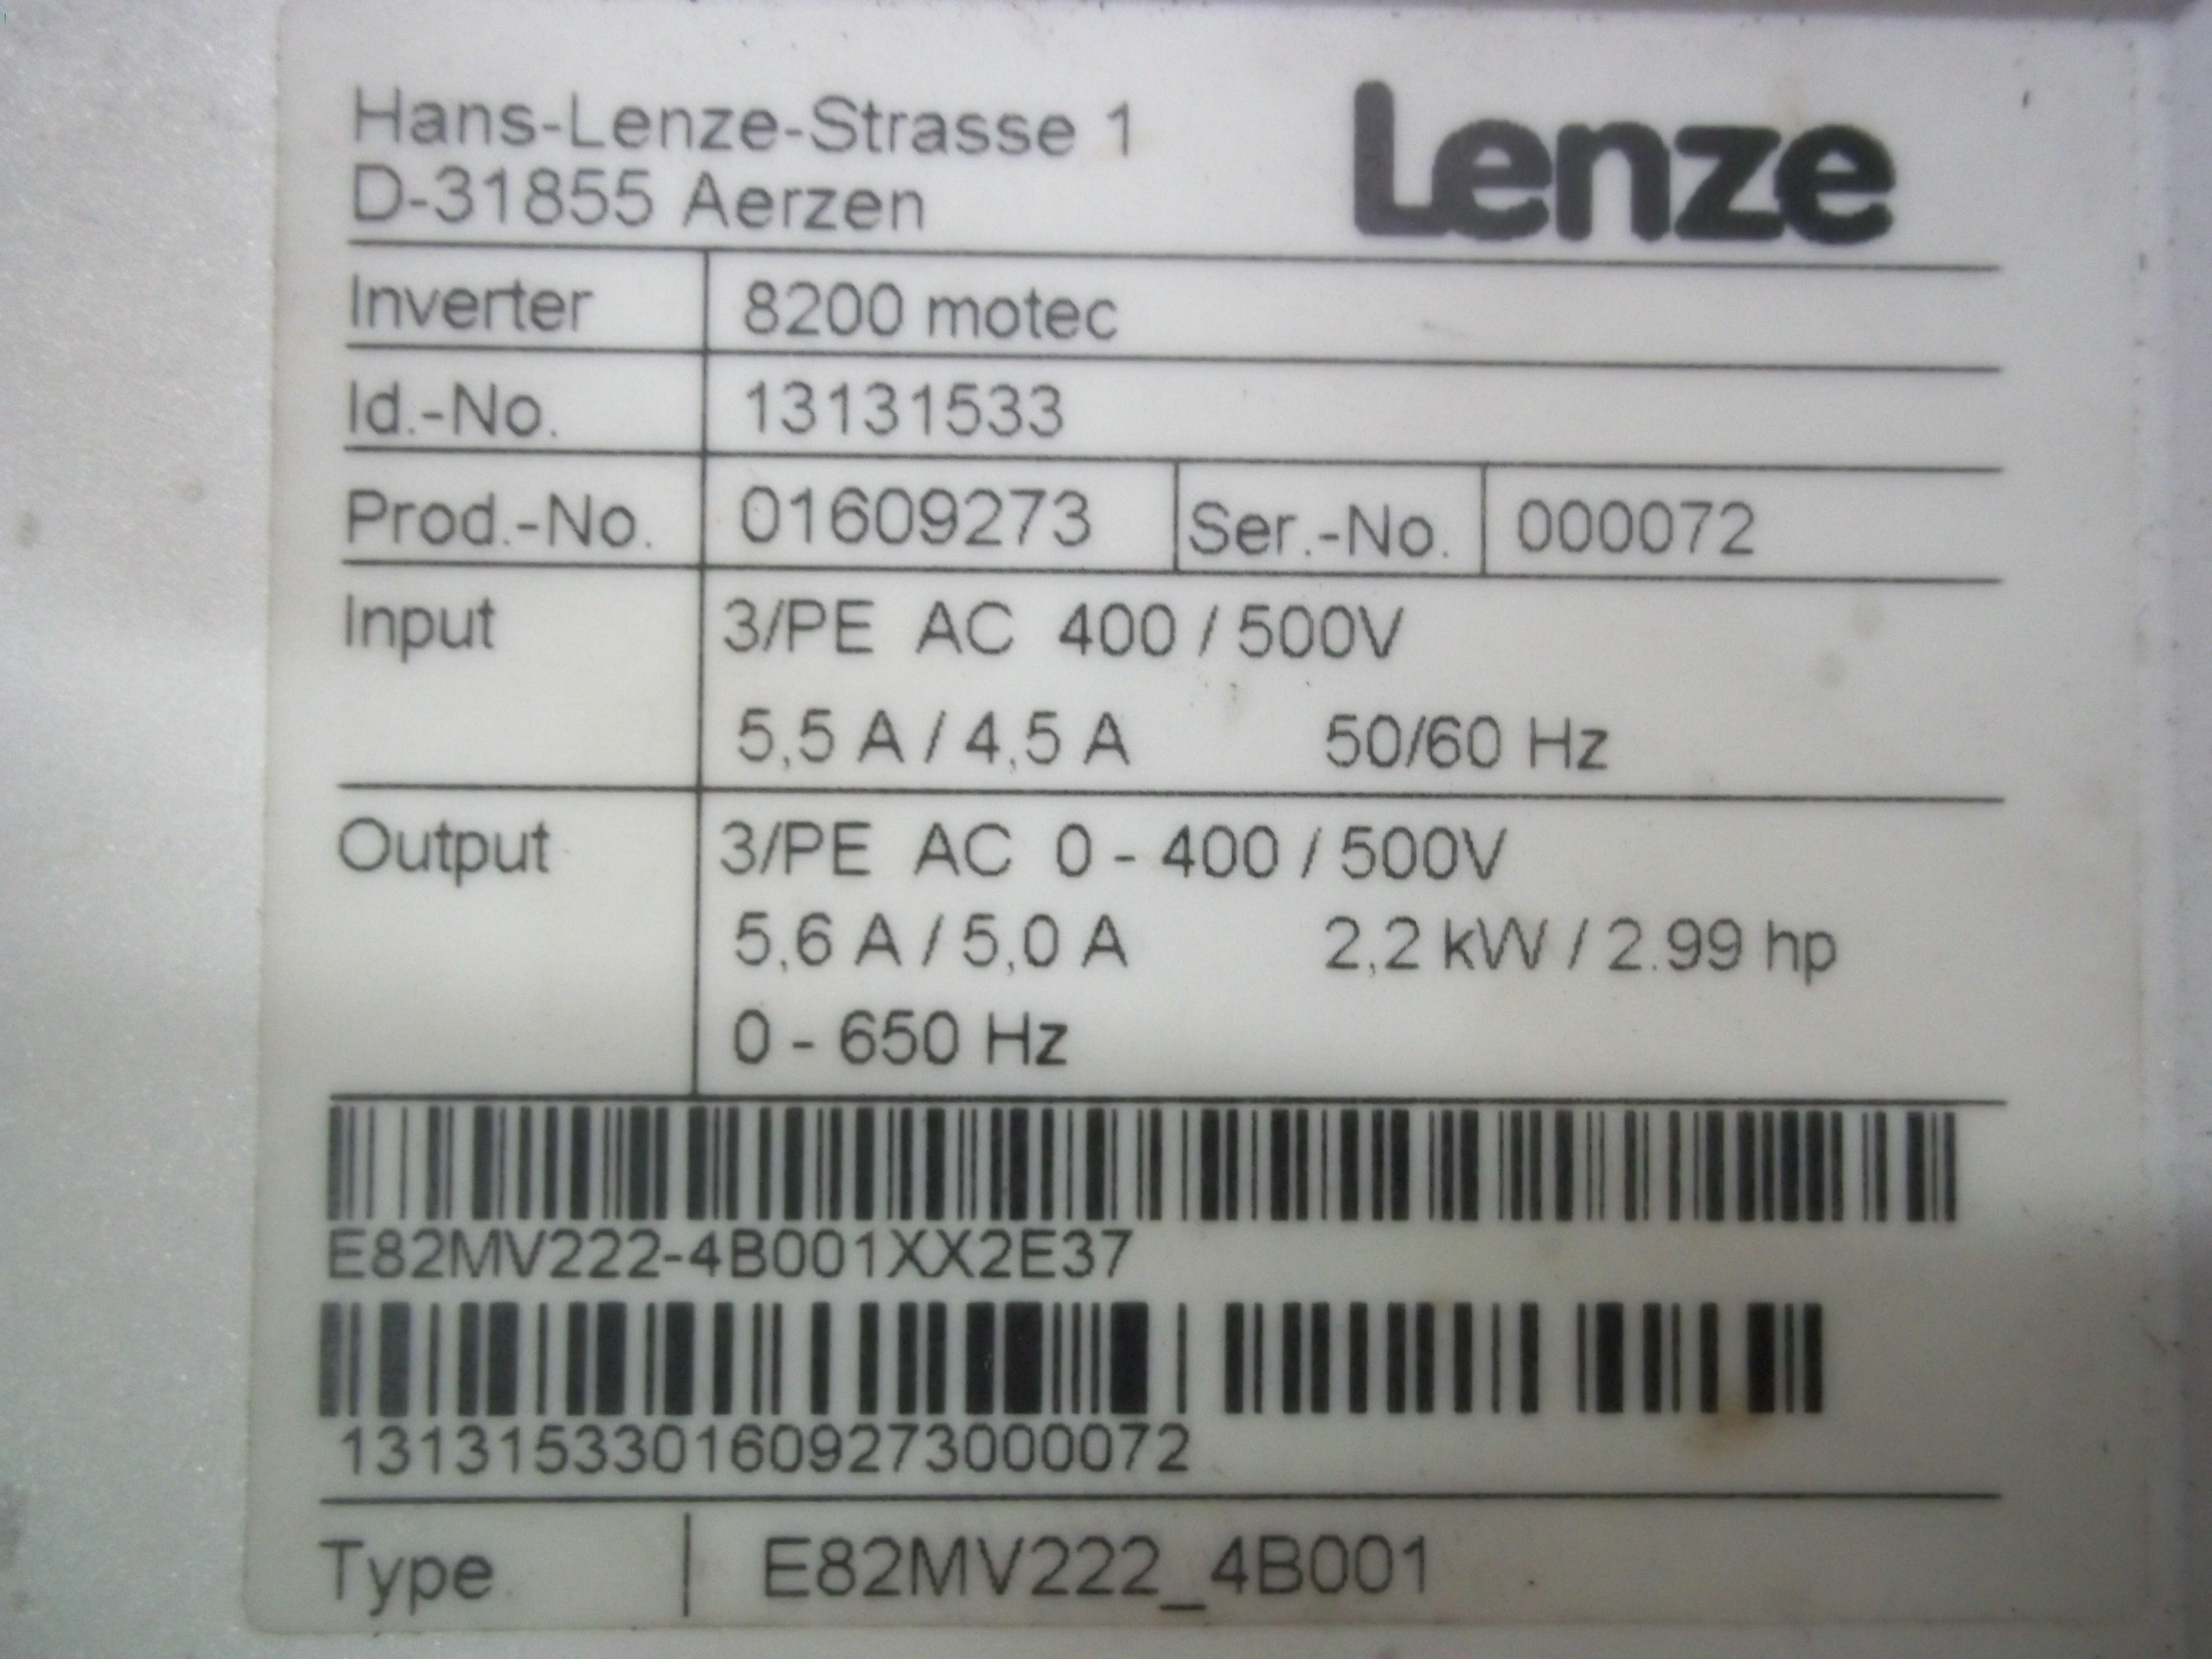 Repair E82MV222_4B001XX2E37 (D-31855) LENZE  LENZE 8200 MOTEC in Malaysia, Singapore, Thailand, Indonesia